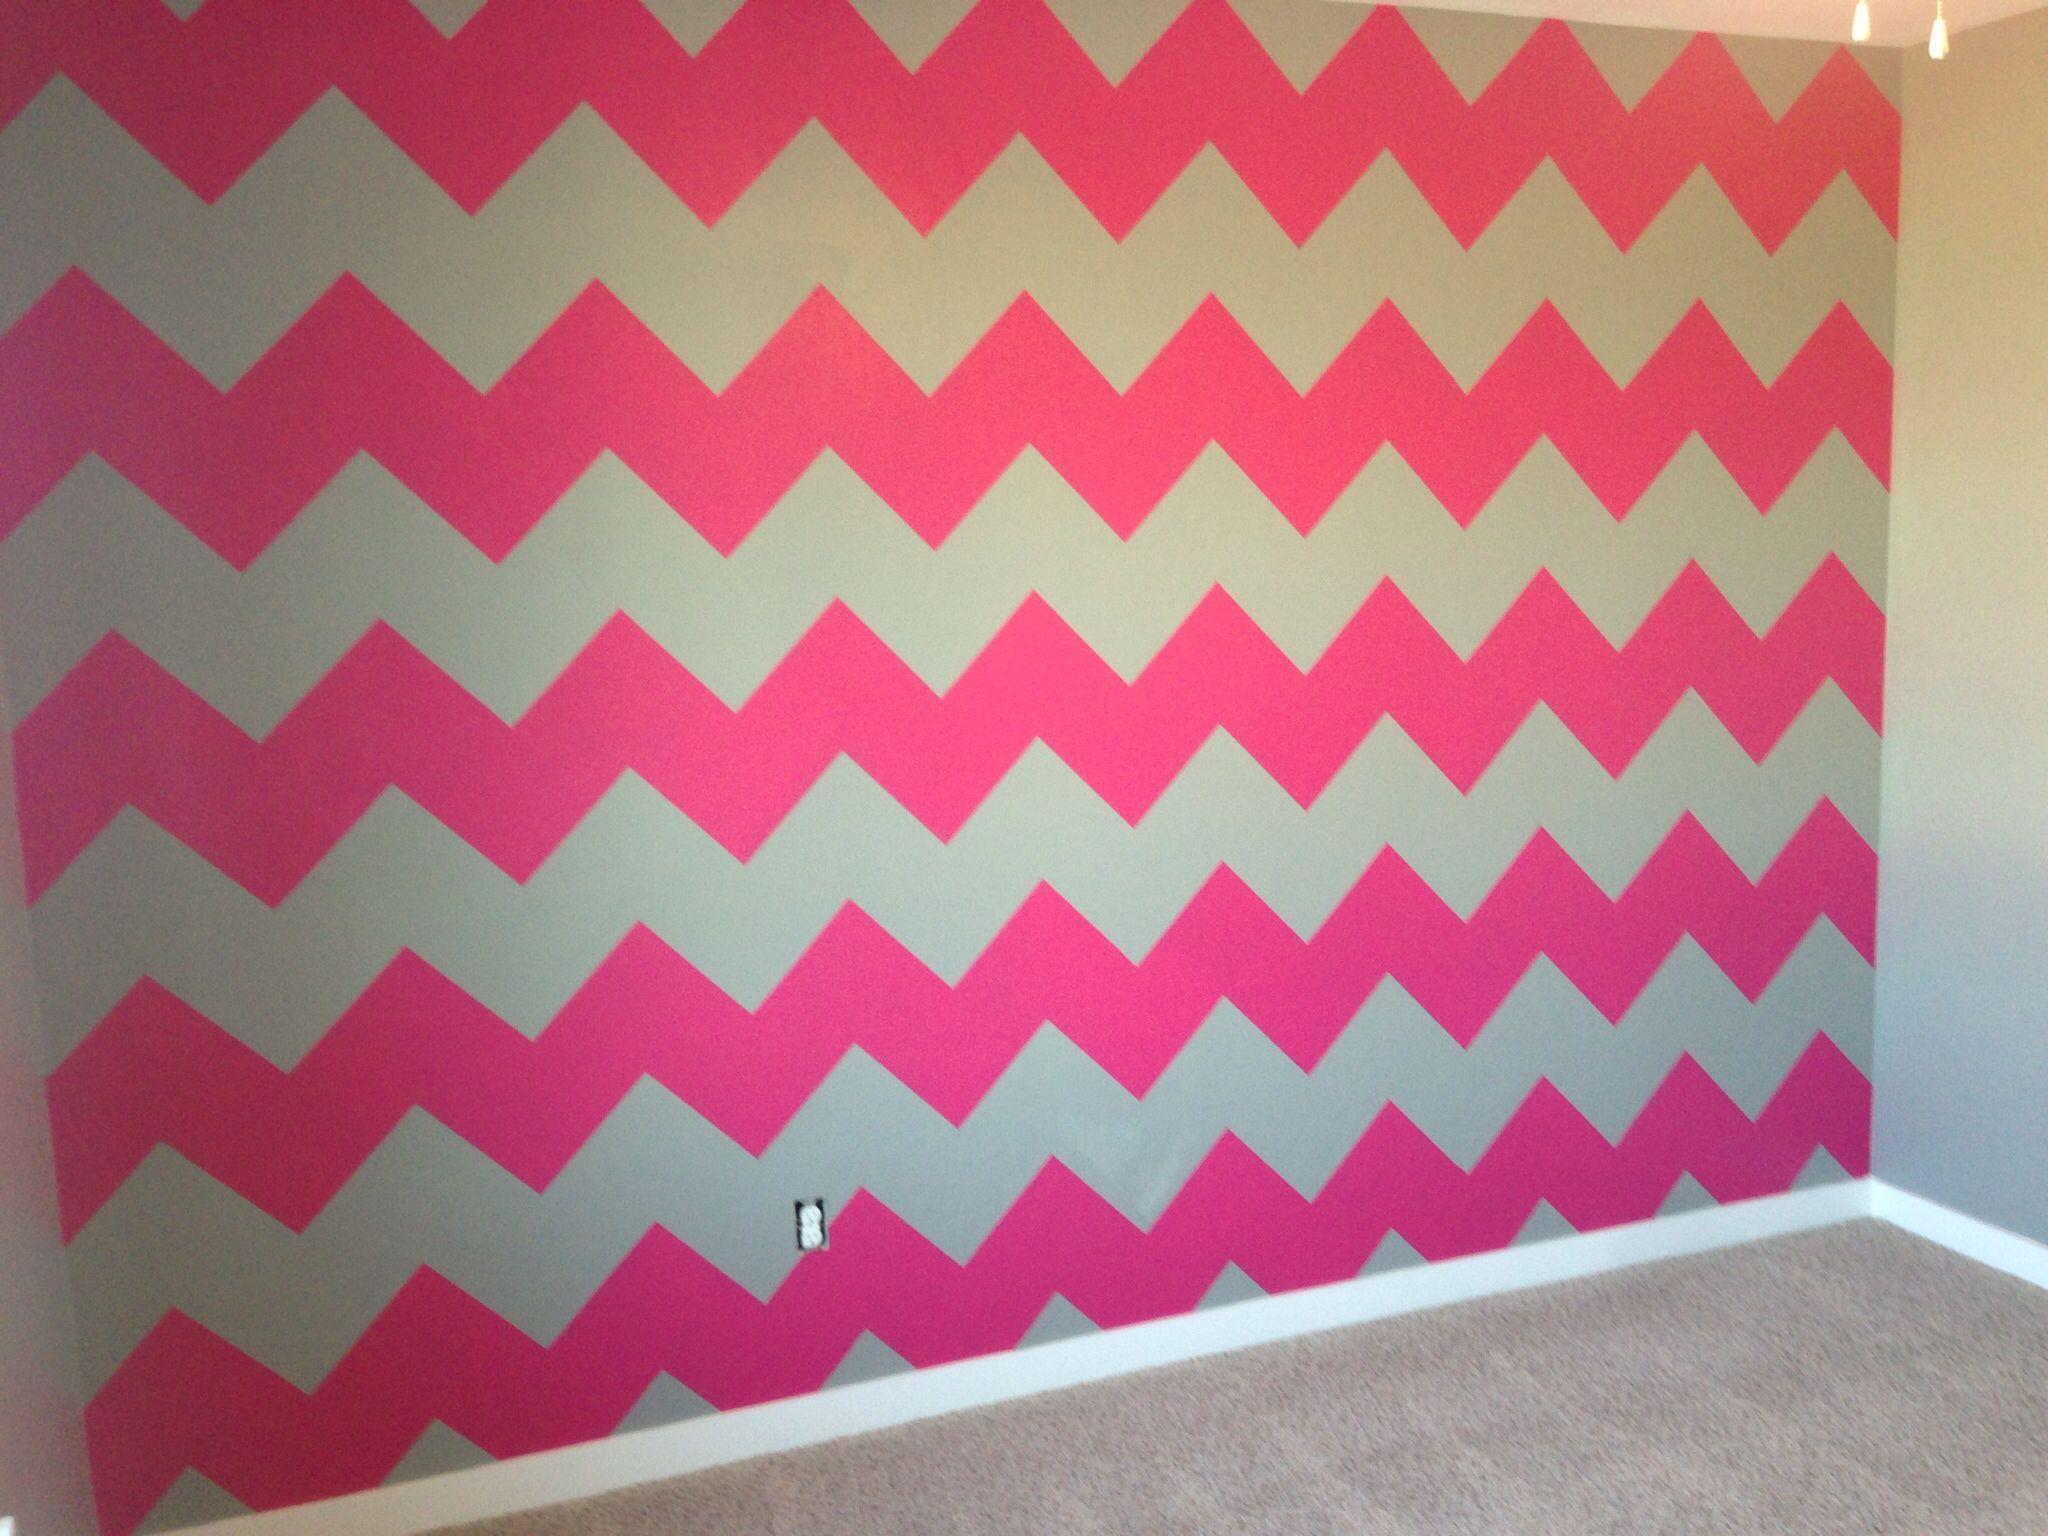 Hot Pink And Gray Chevron Wall Baby Girl Room Pink Pink Girl Room Gray Striped Walls